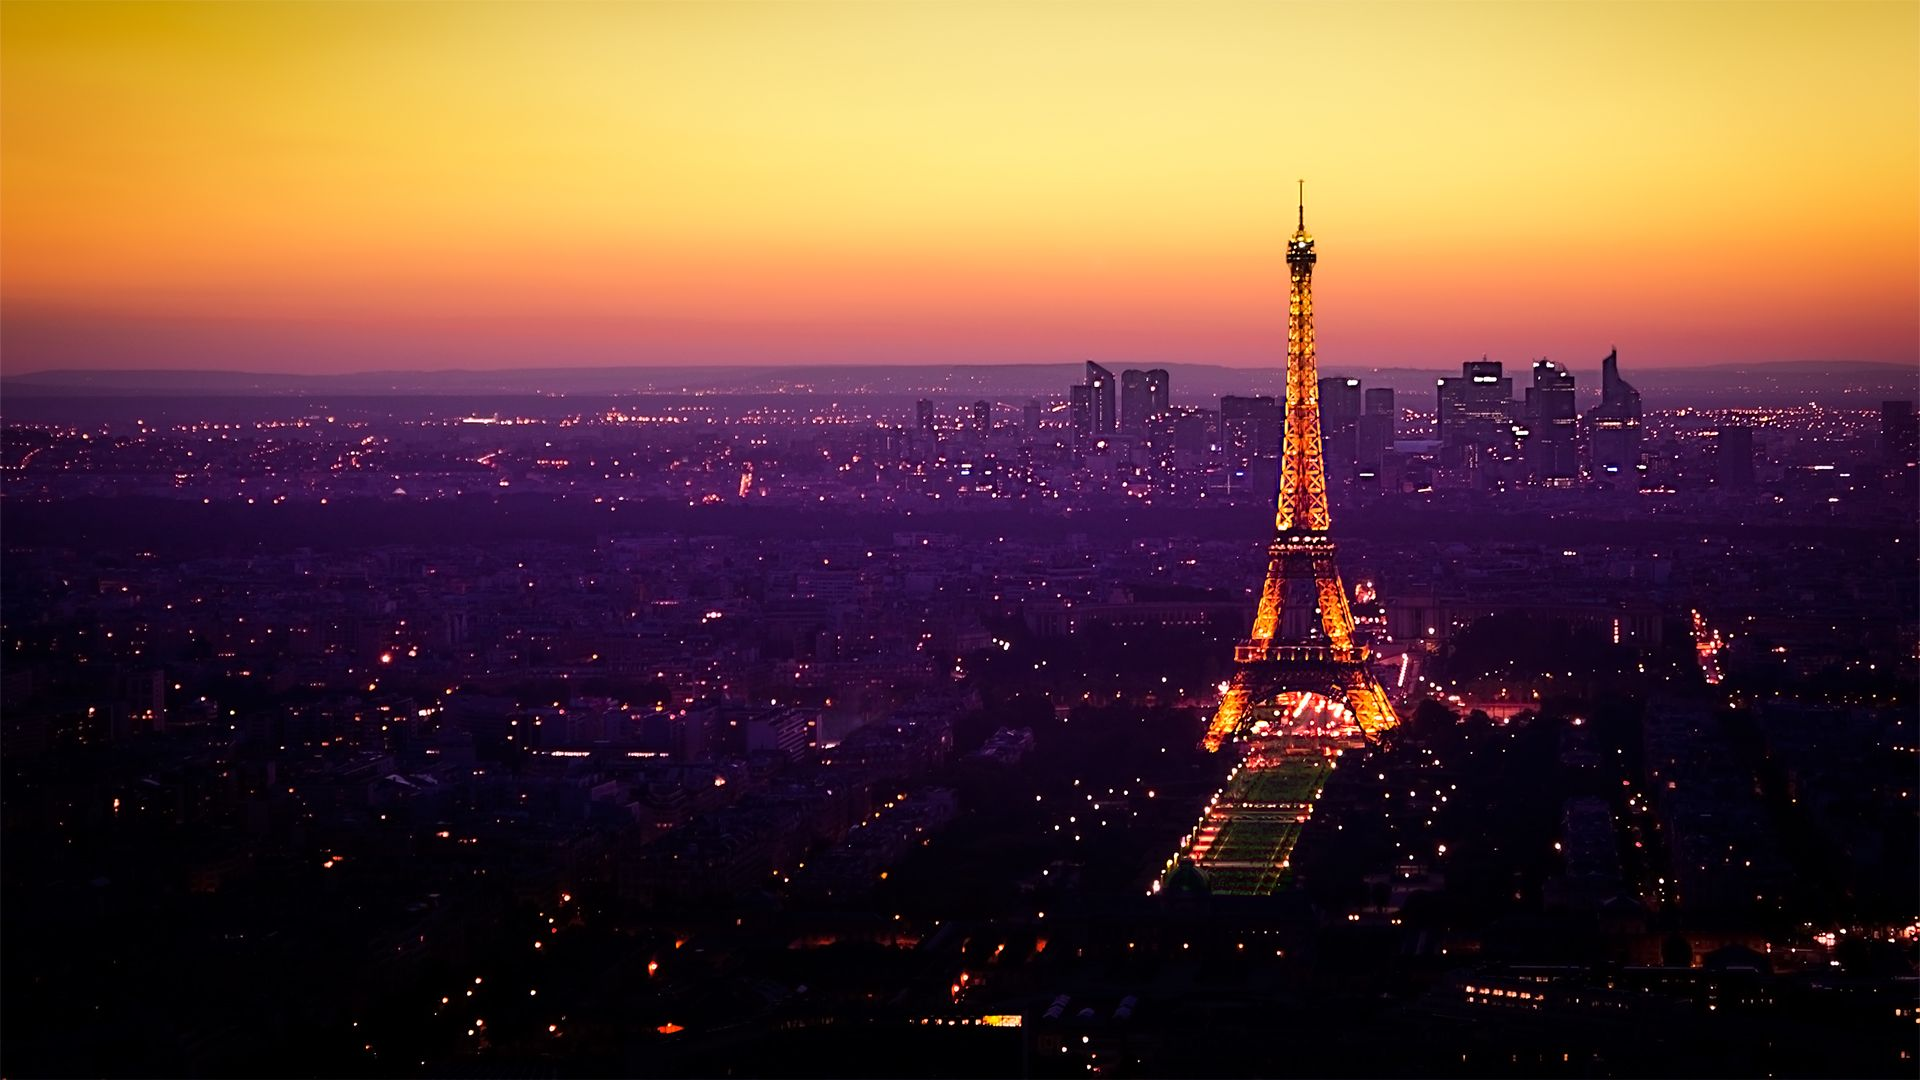 Paris At Night Wallpapers Top Free Paris At Night